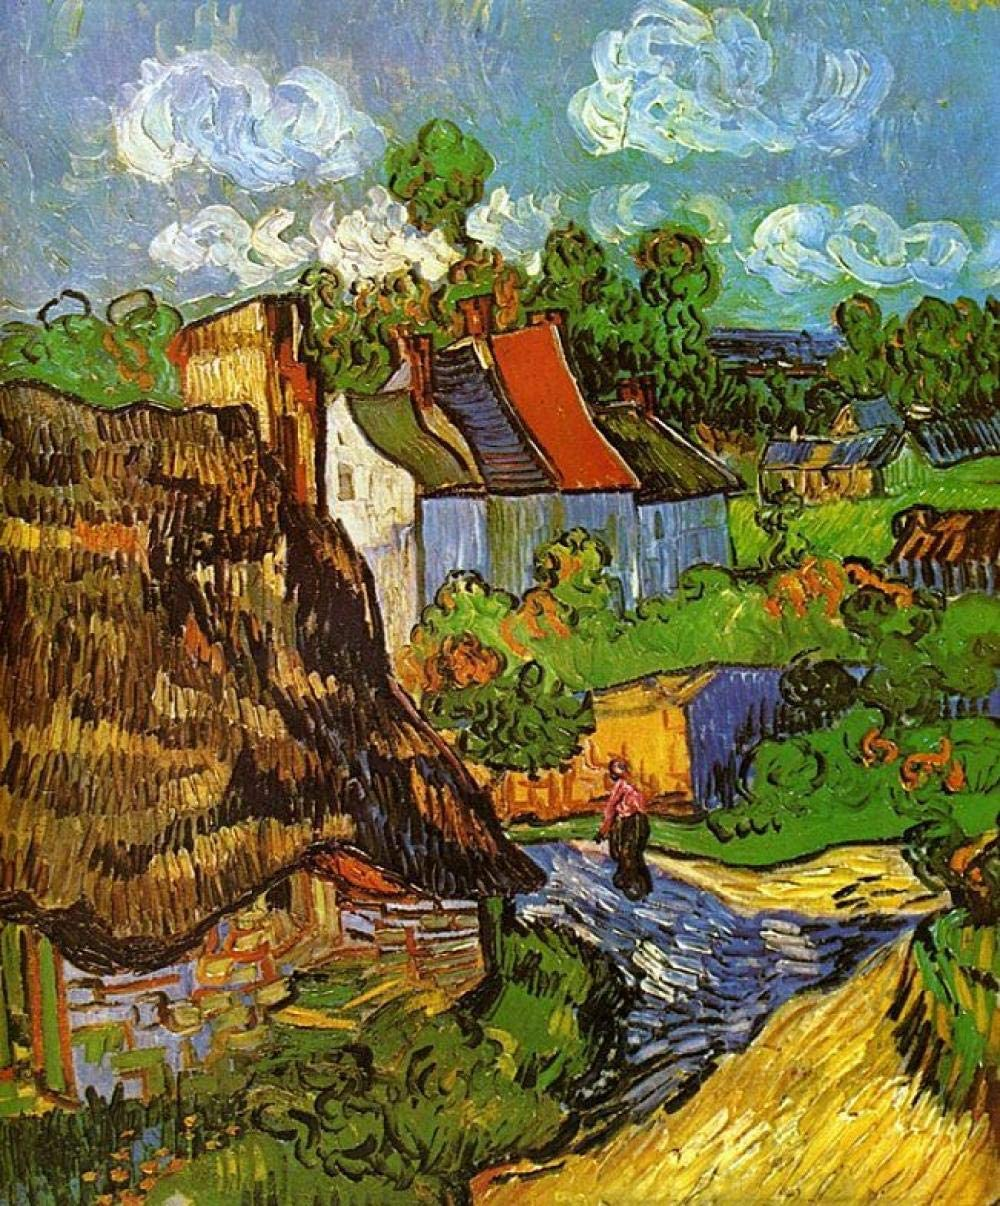 EJCNCL Pintar por Numeros para Adultos Ni/ñOs 40x50cm Casa Van Goghs Adultos F/ácil de Operar Principiantes Dibujados A Mano Dormitorio Sal/óN Decoracion